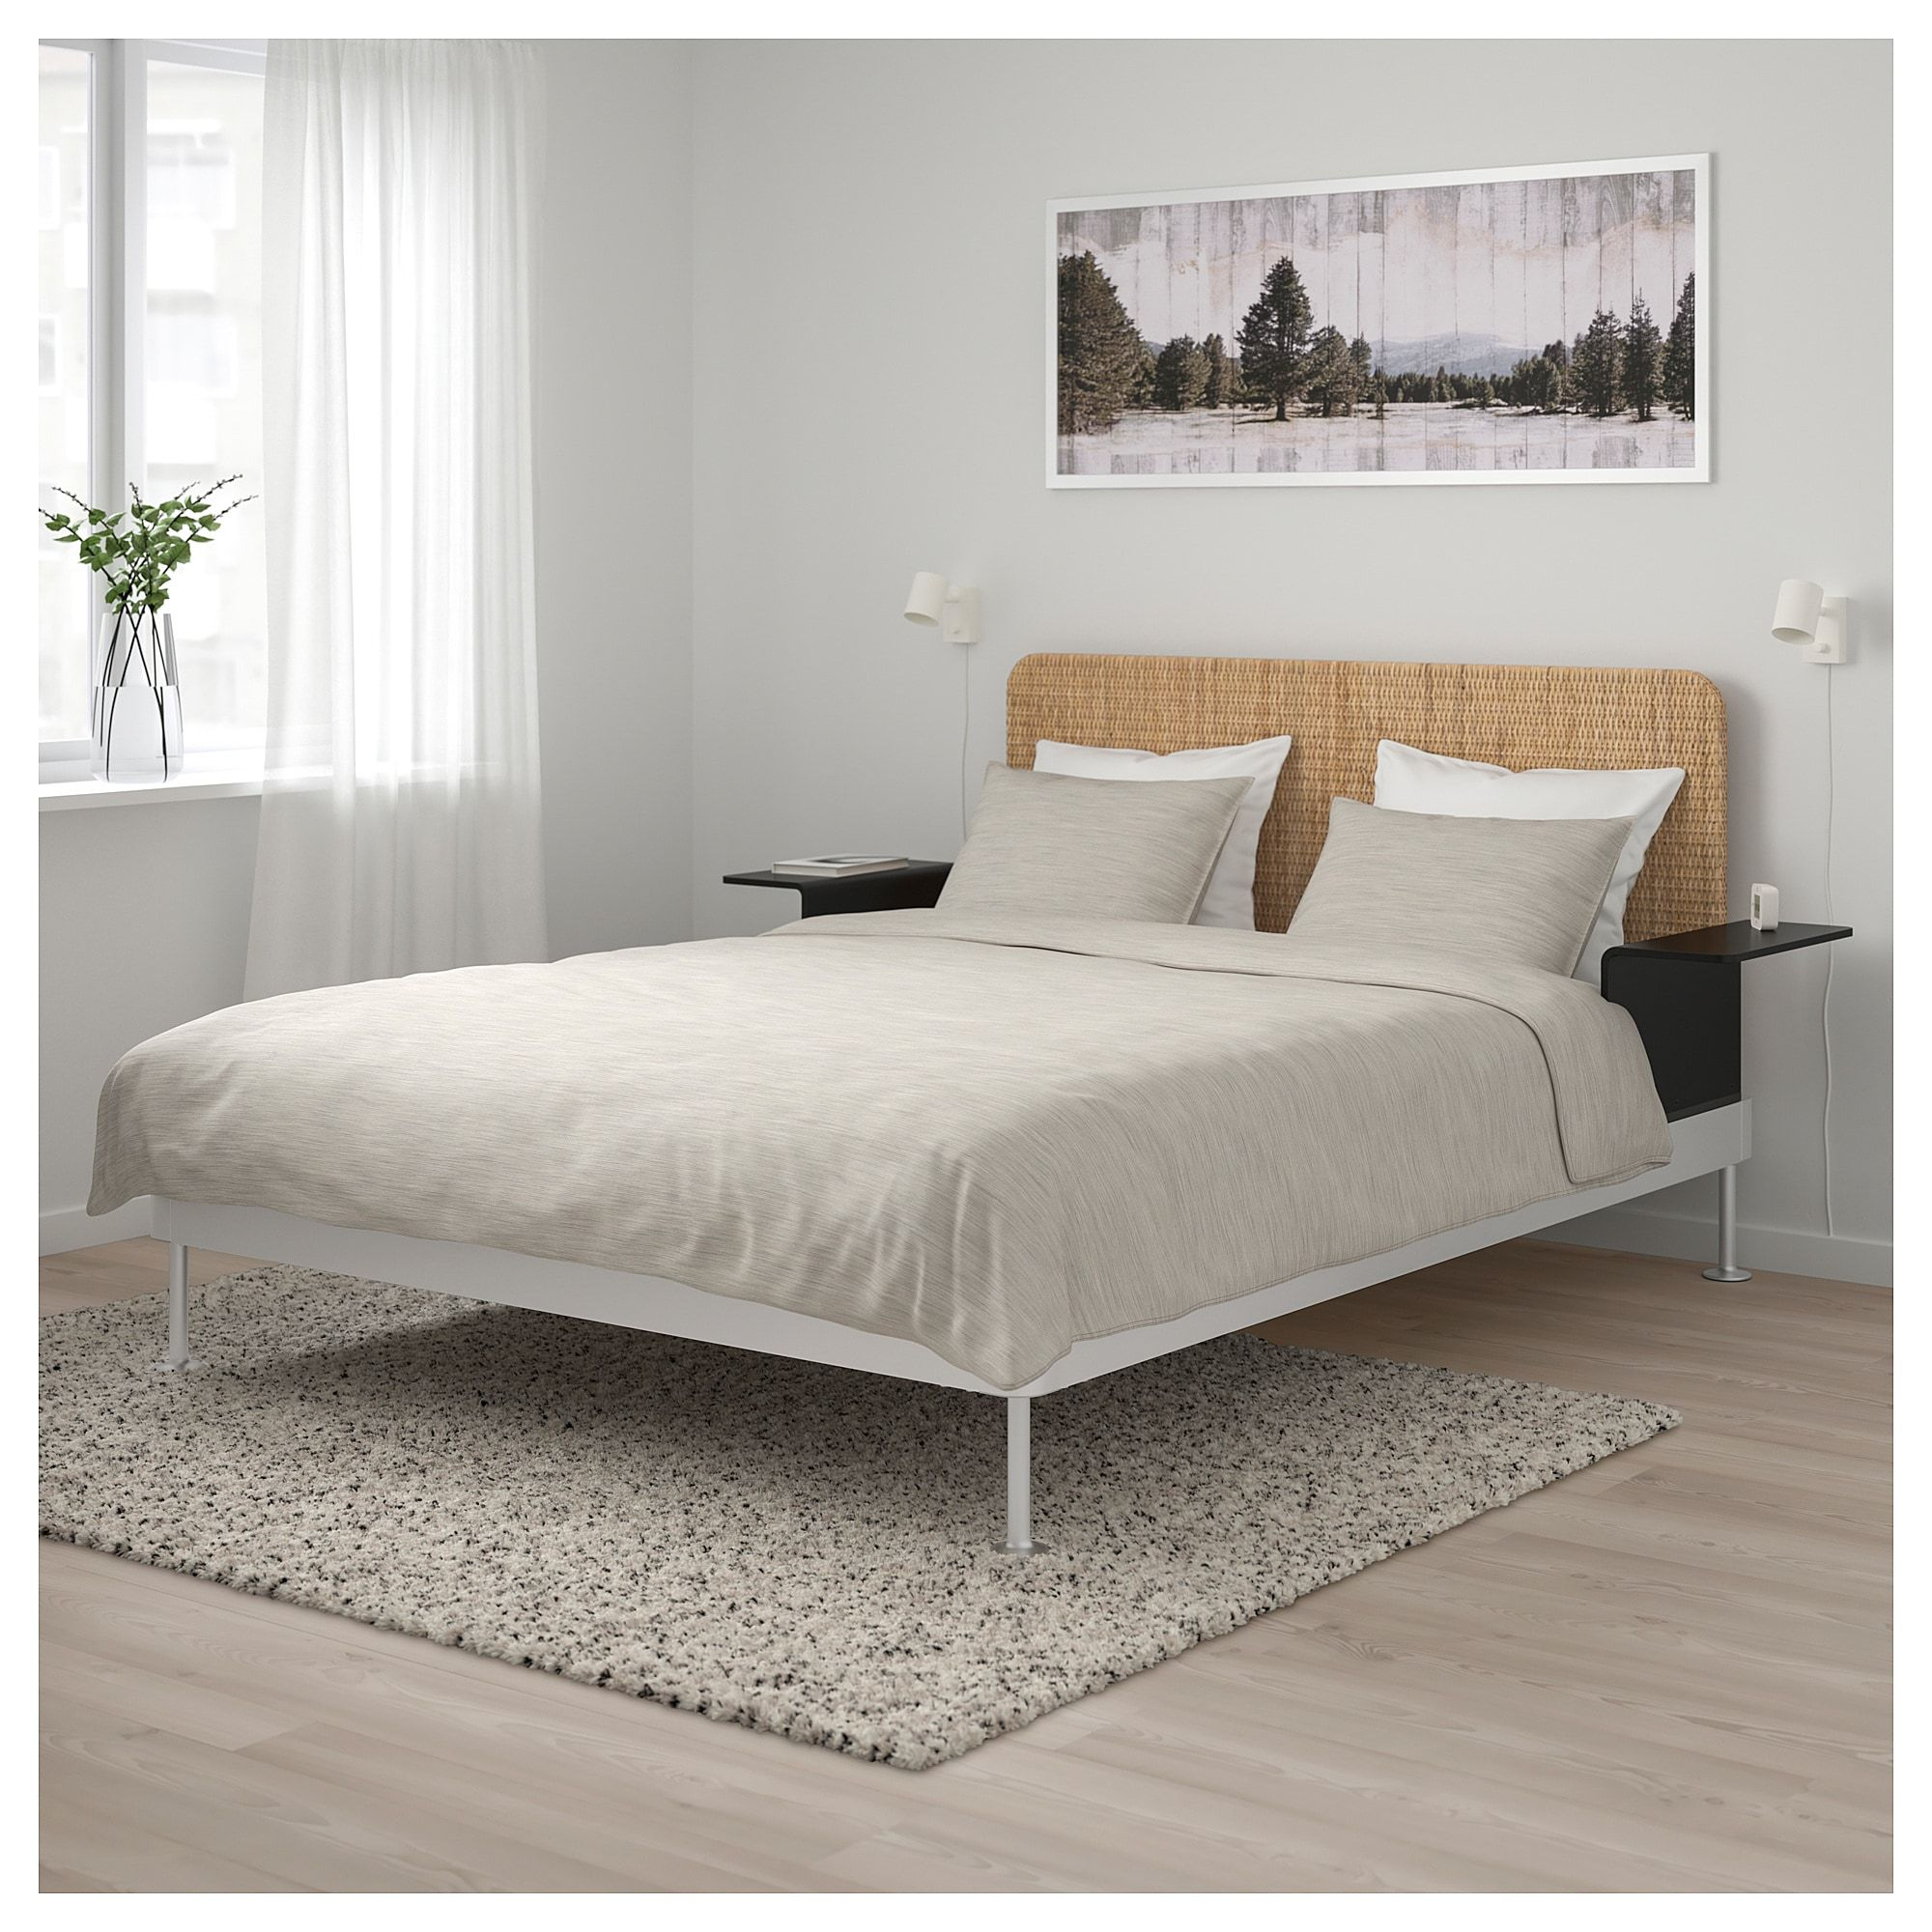 Delaktig Bed Frame Headboard 2 Side Tables Aluminum Rattan Ikea Bed Frame And Headboard Bed Frame Headboard